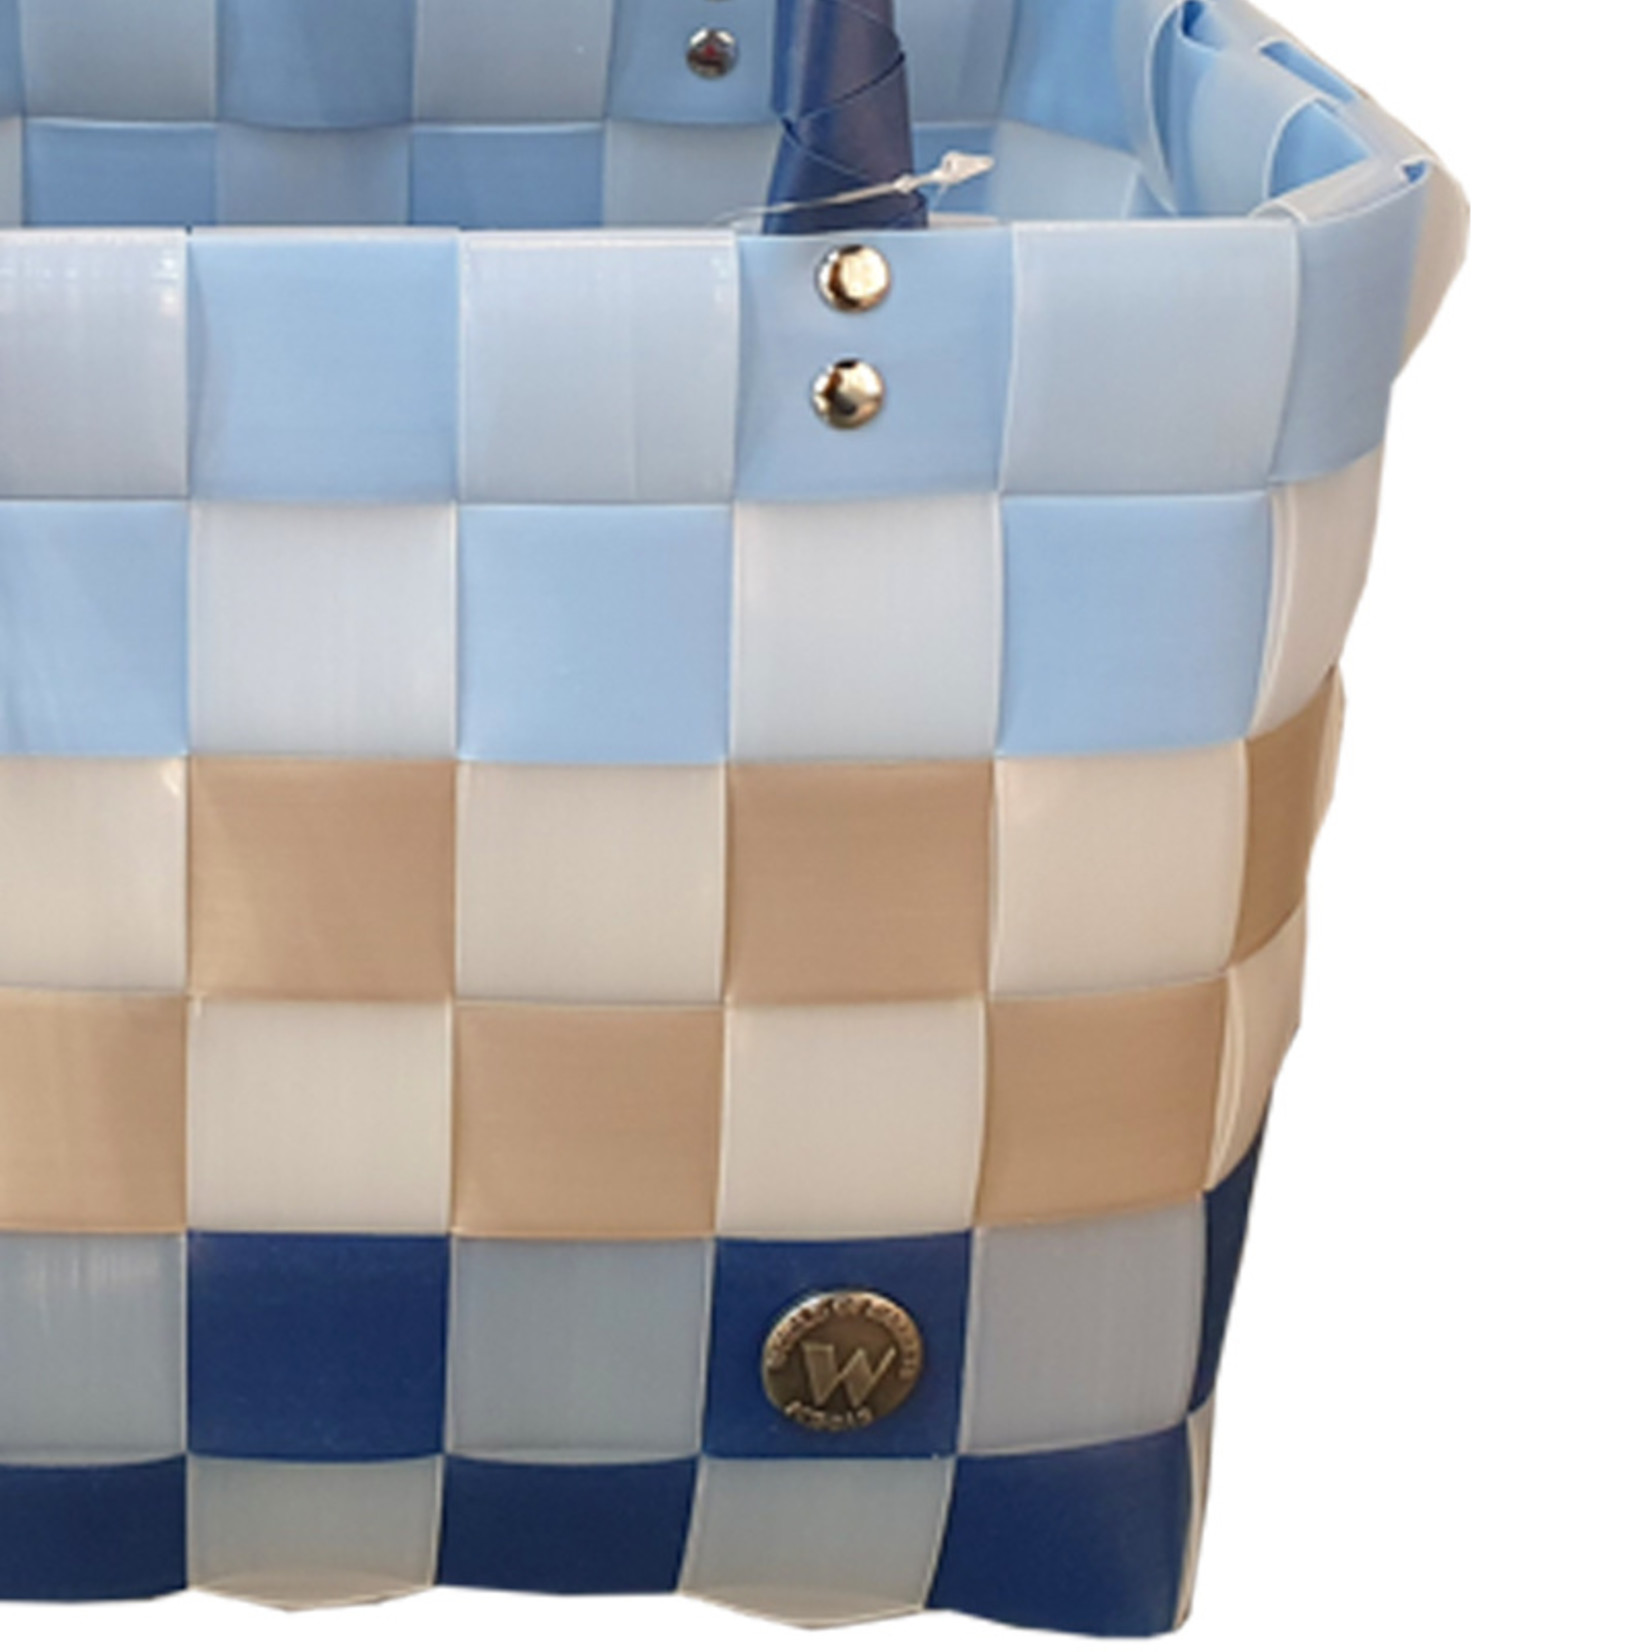 ICE BAG Taschen ICE BAG Mini Shopper 5008-42 | Original Witzgall Tasche | blau-beige